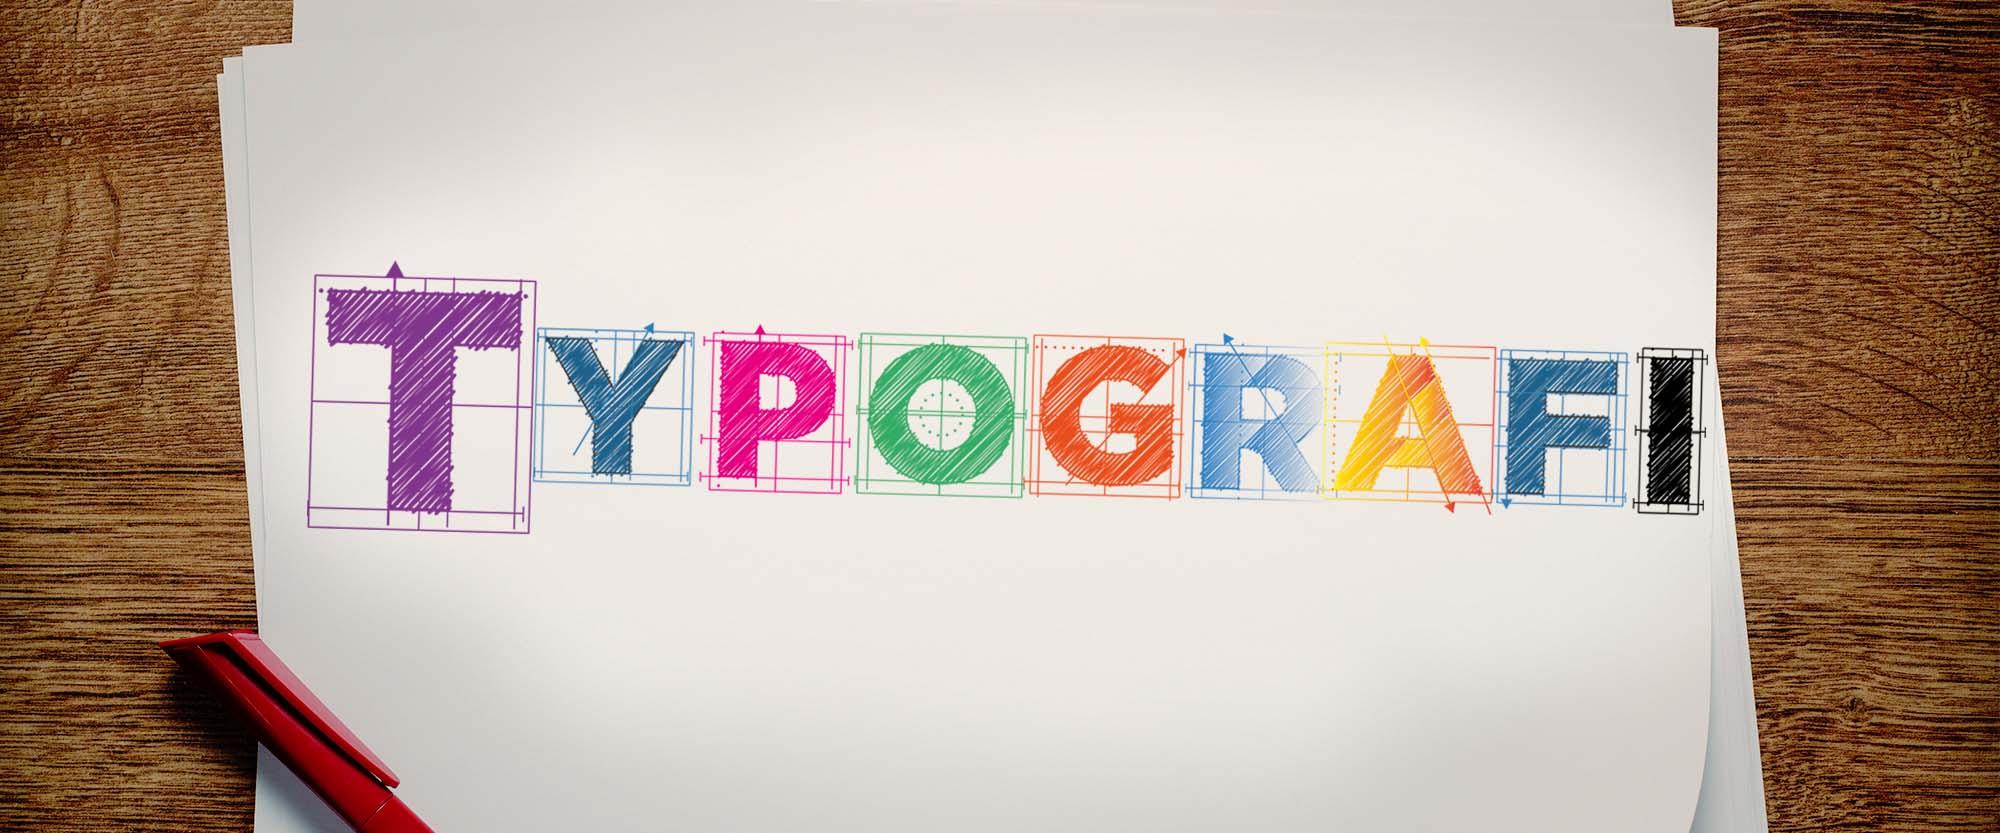 Onlinekurs Typografi